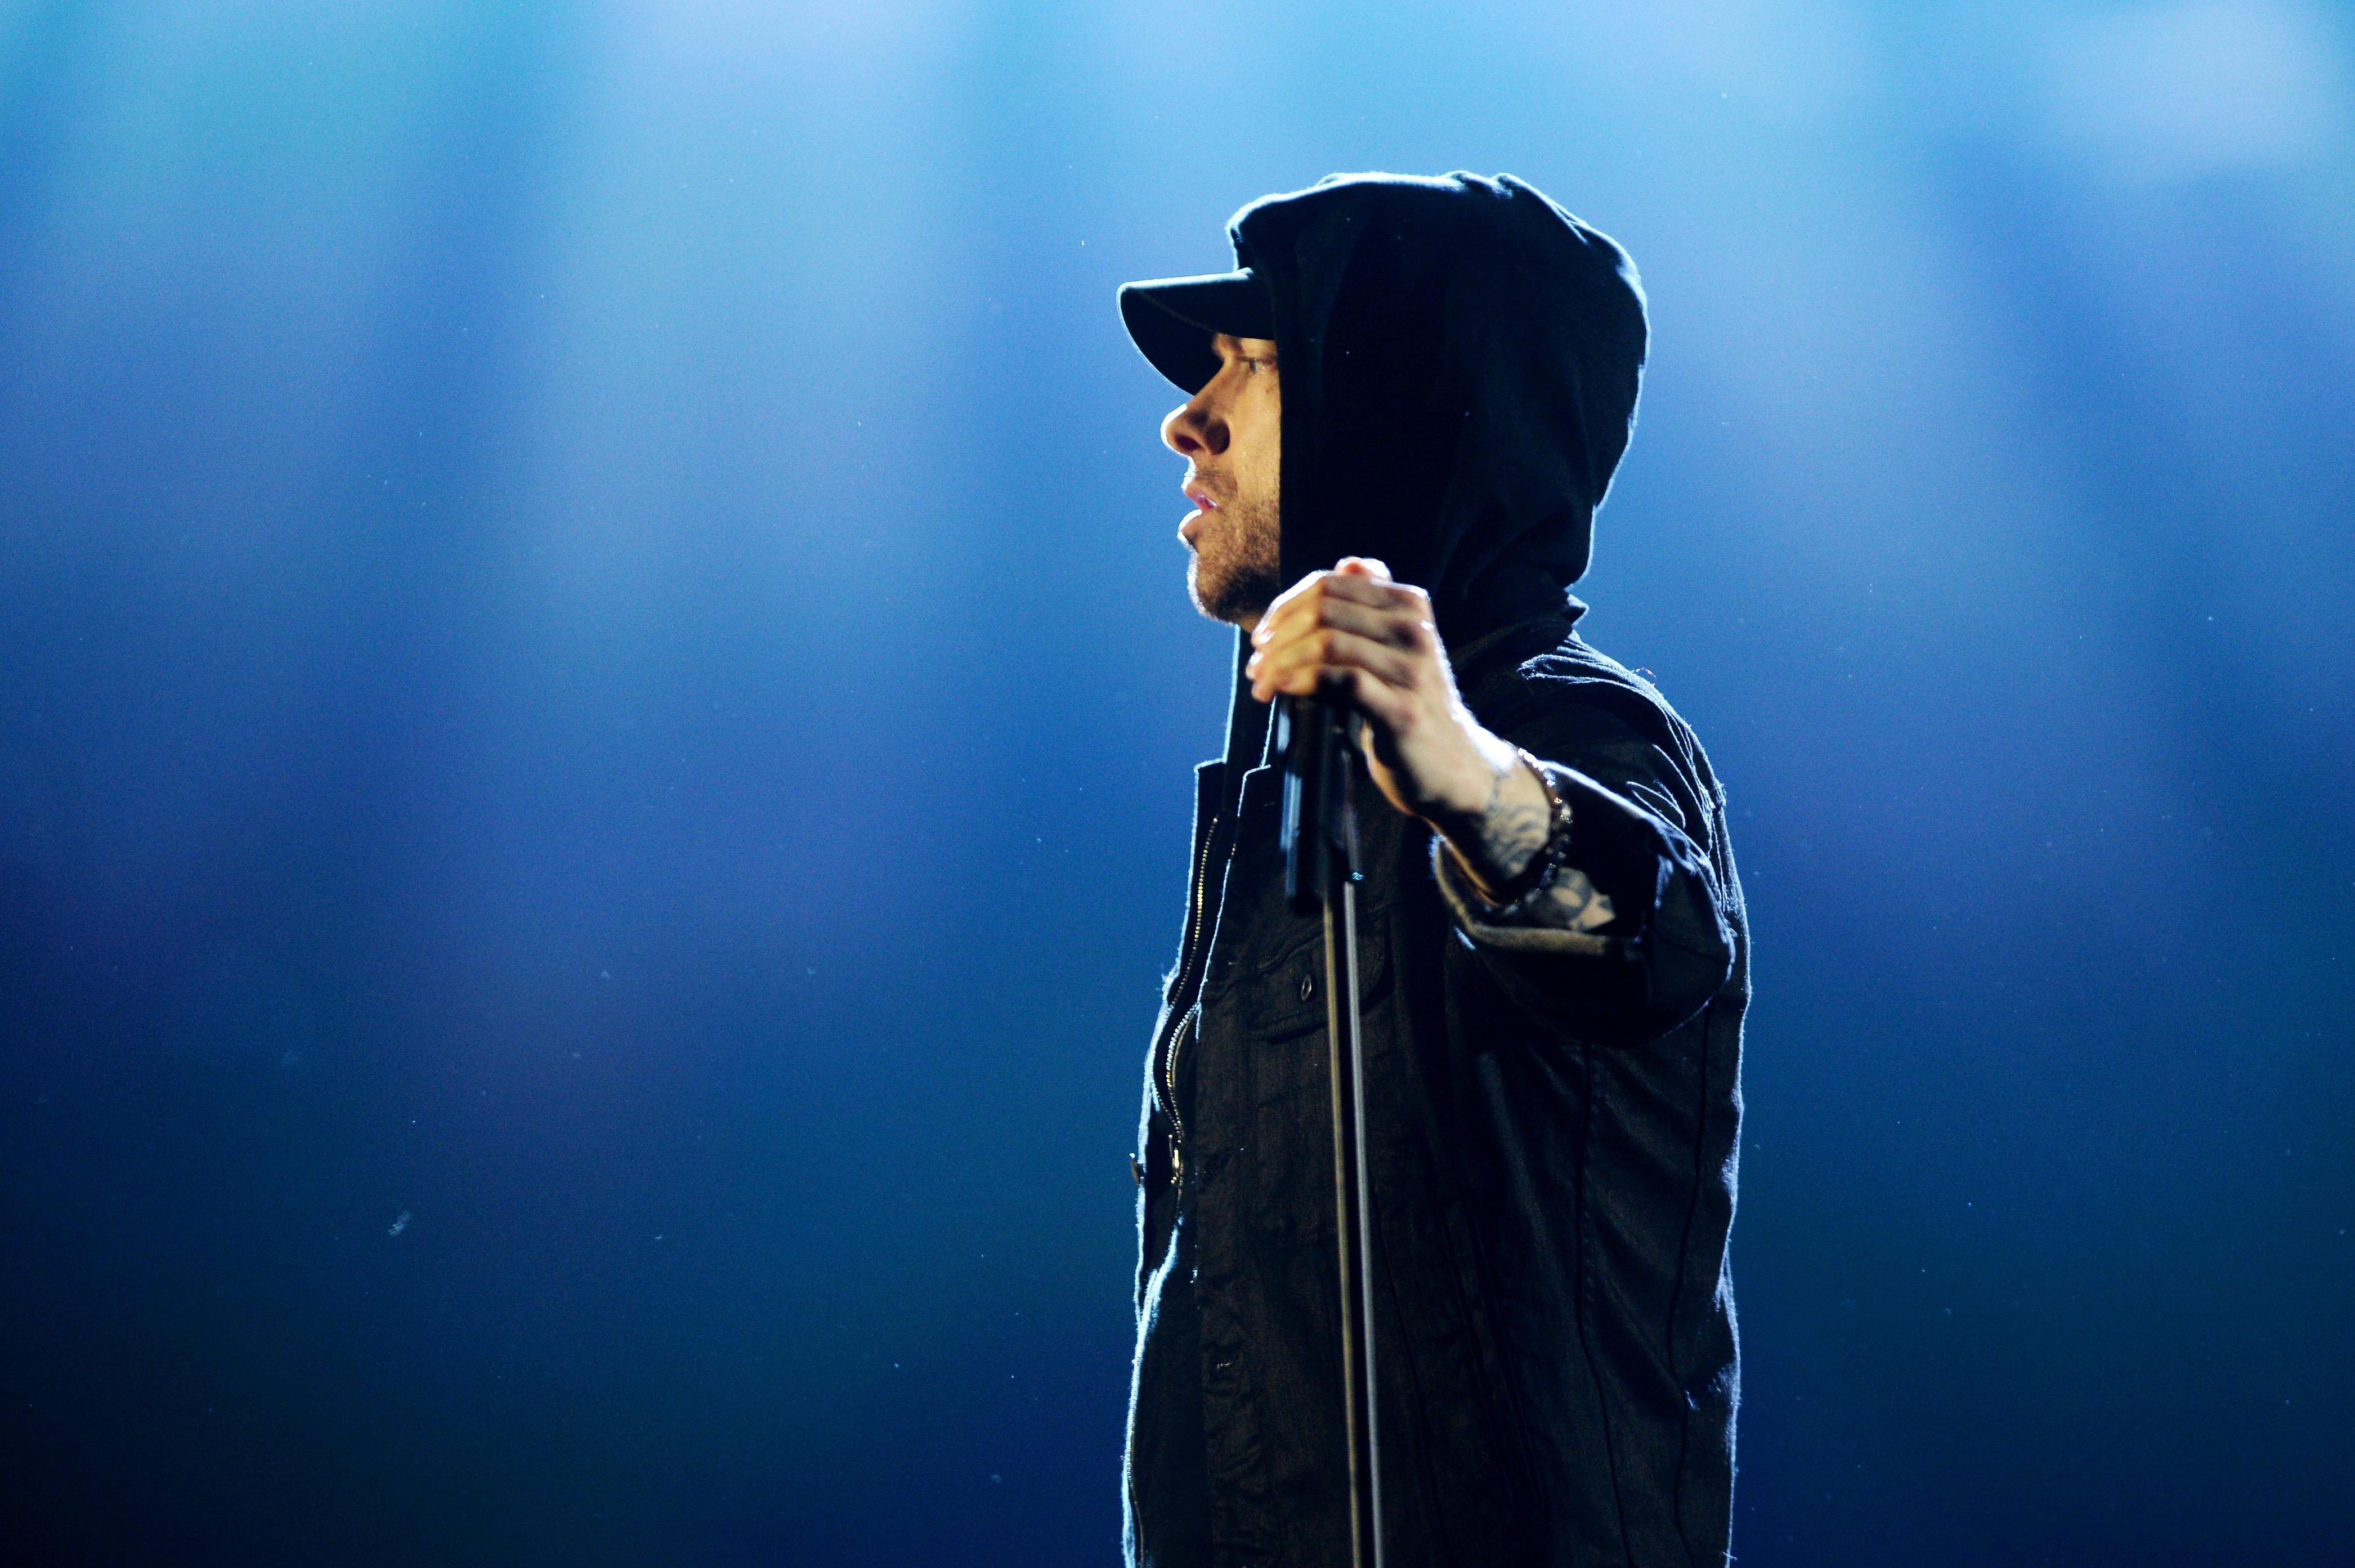 Eminem performs on stage.